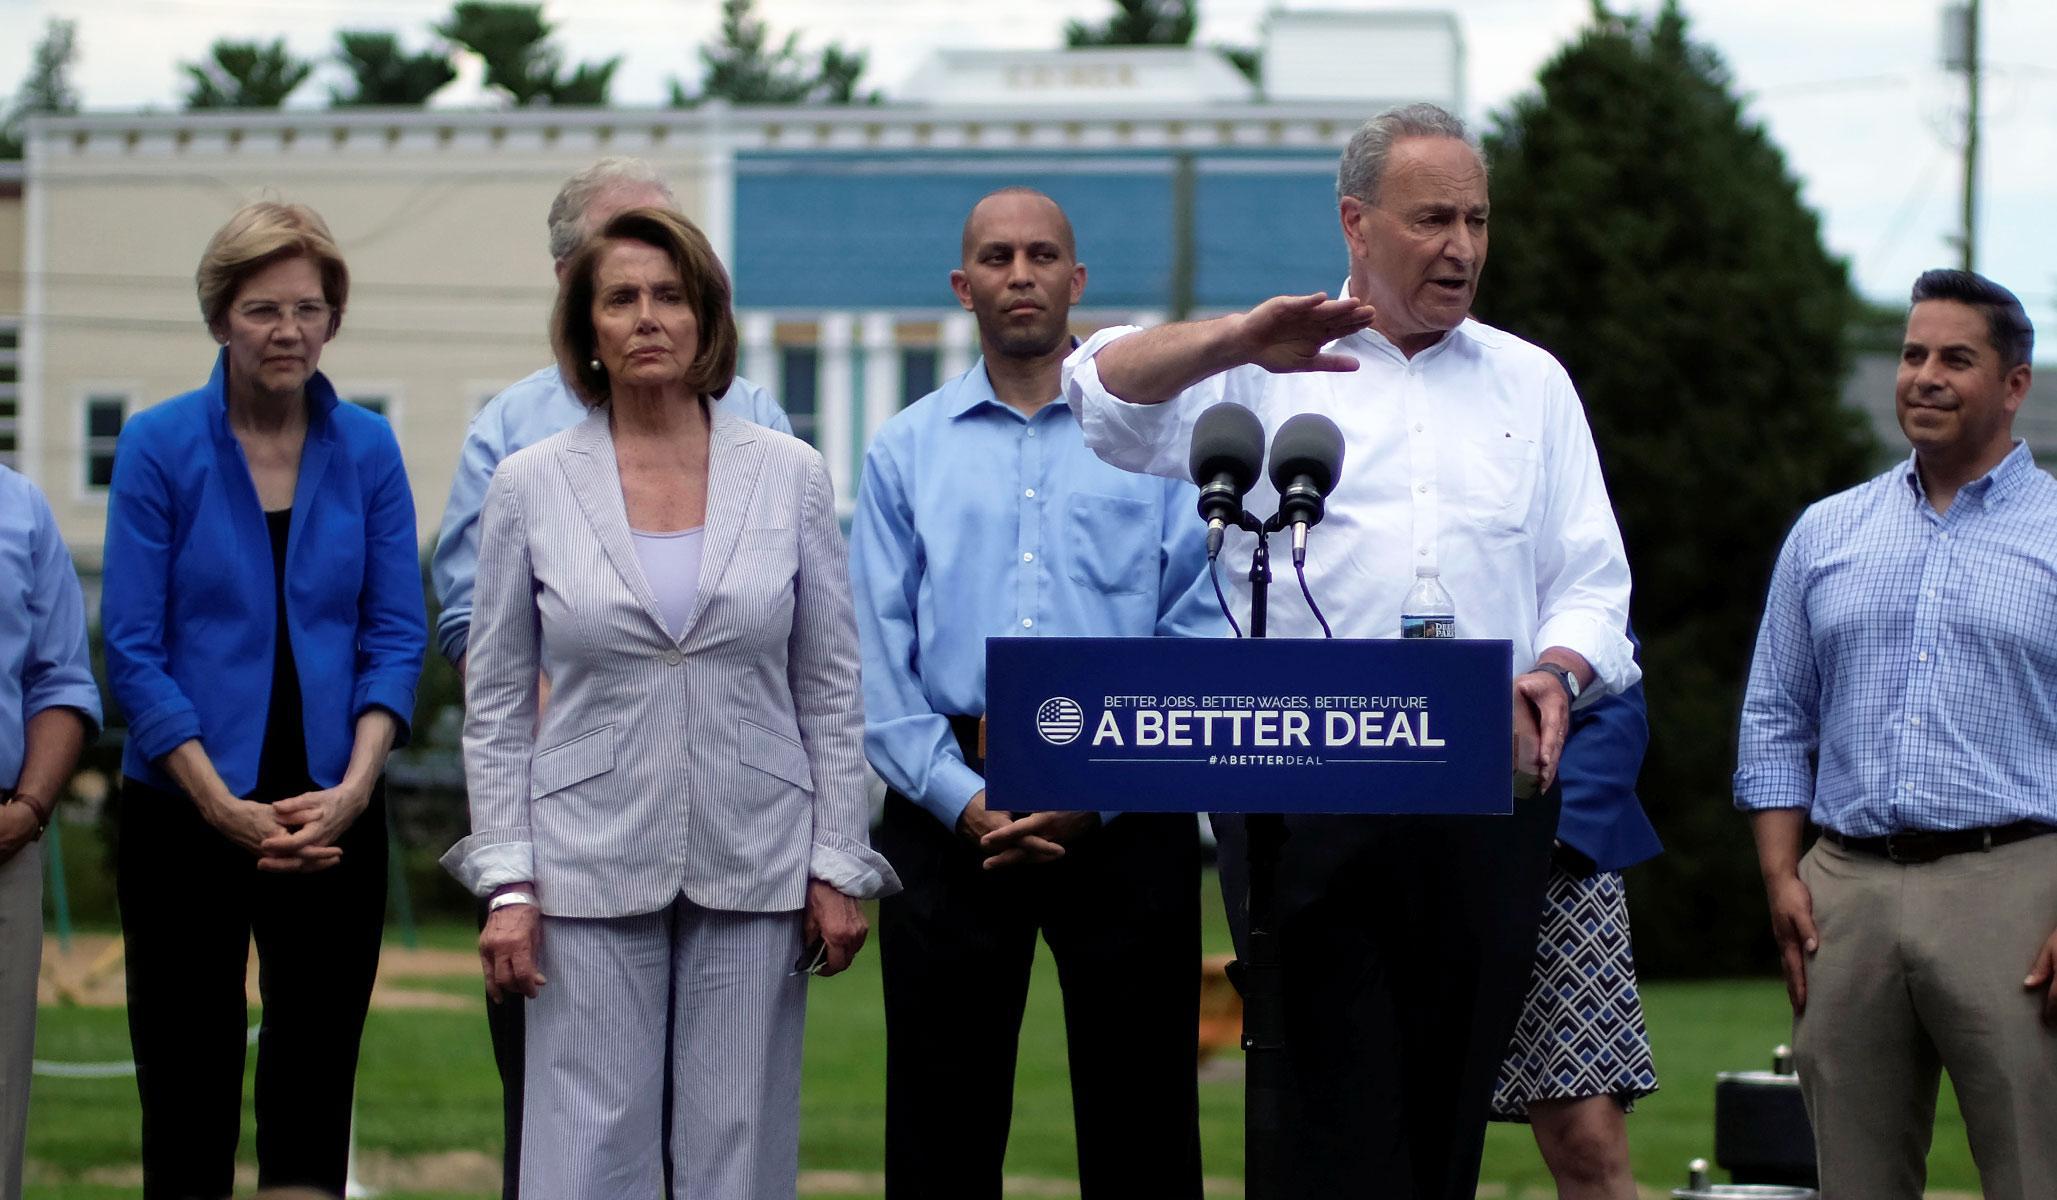 (L-R) Elizabeth Warren, Nancy Pelosi, Chuck Schumer//Berryville, VA. July 25th, 2017.